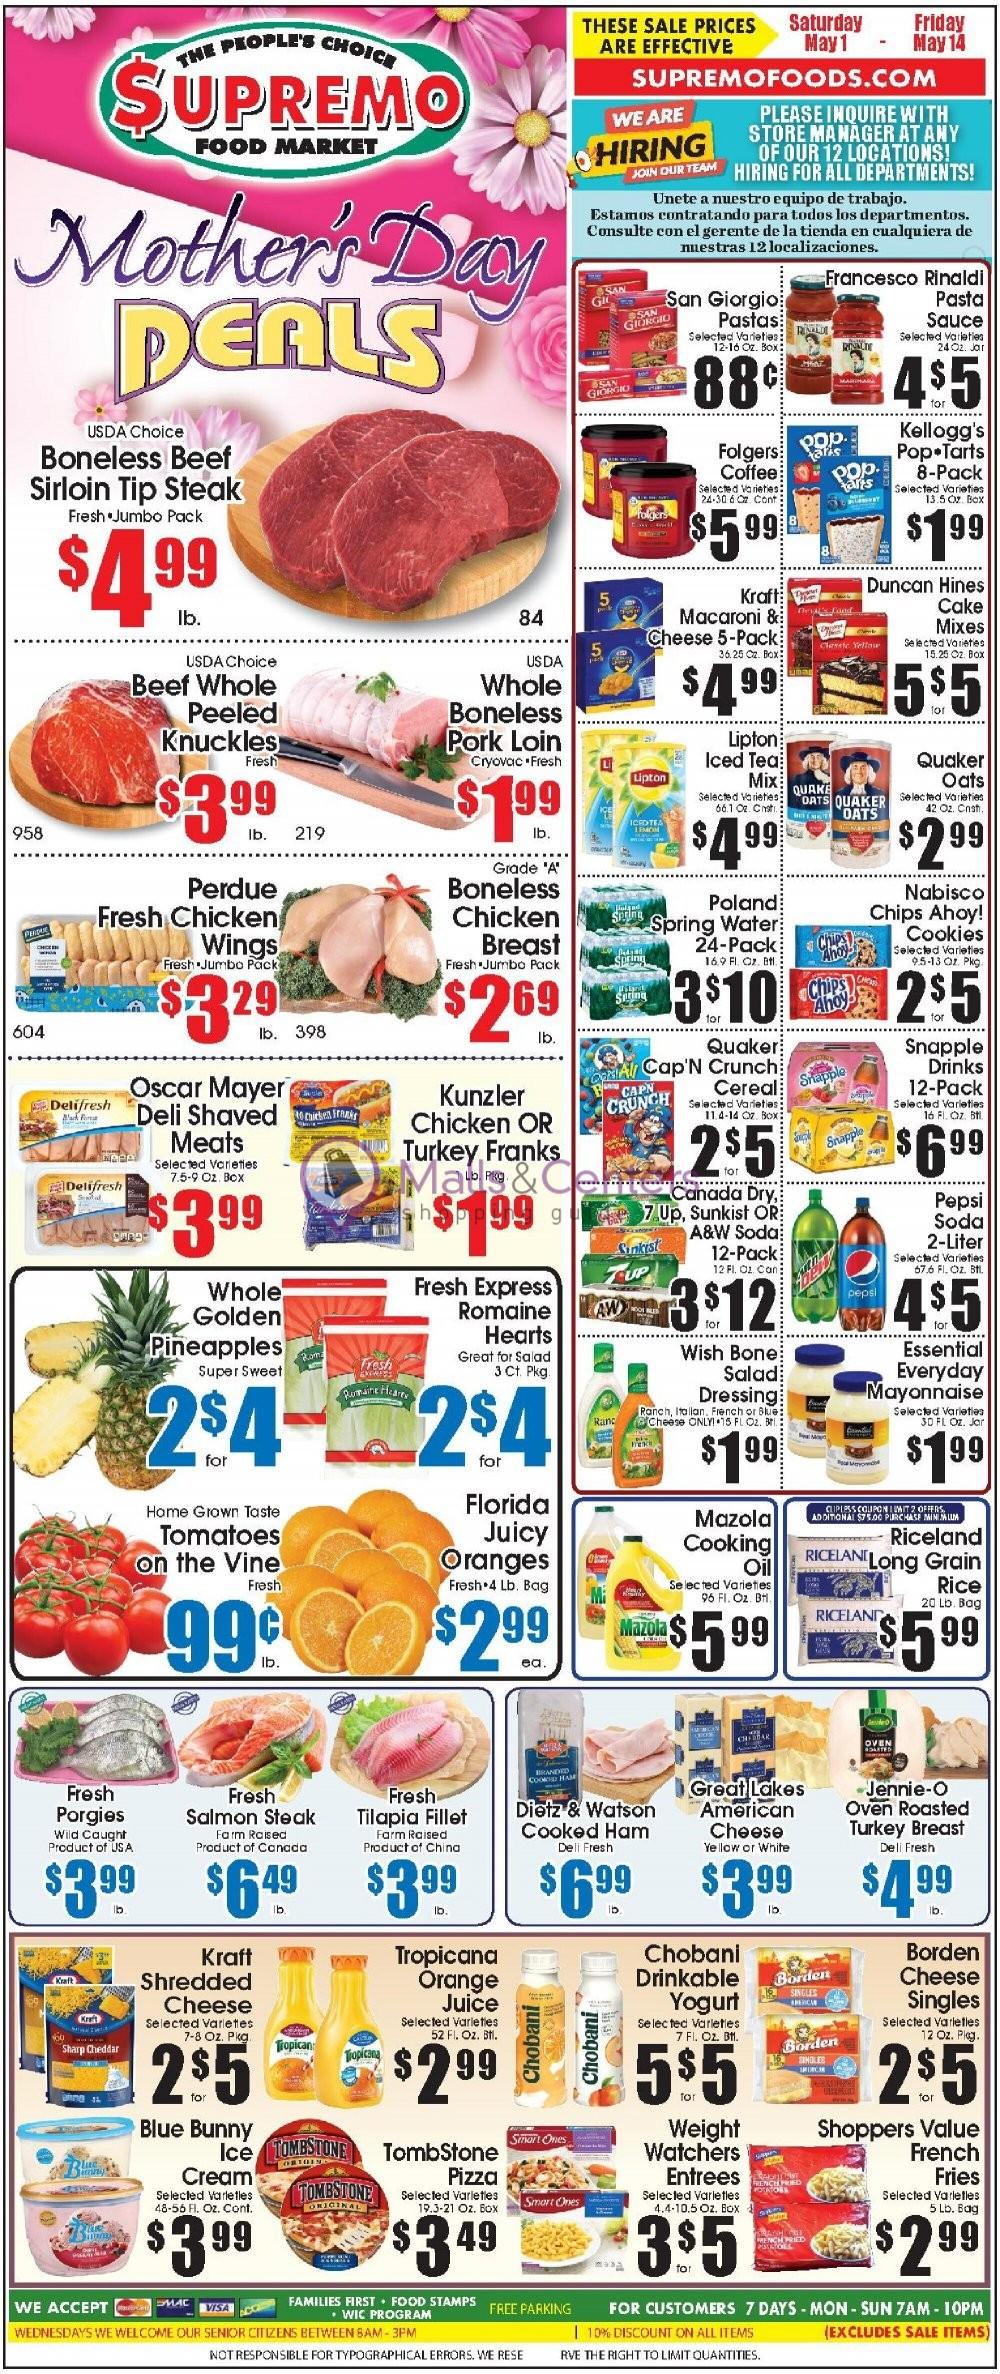 weekly ads Supremo Food Market - page 1 - mallscenters.com